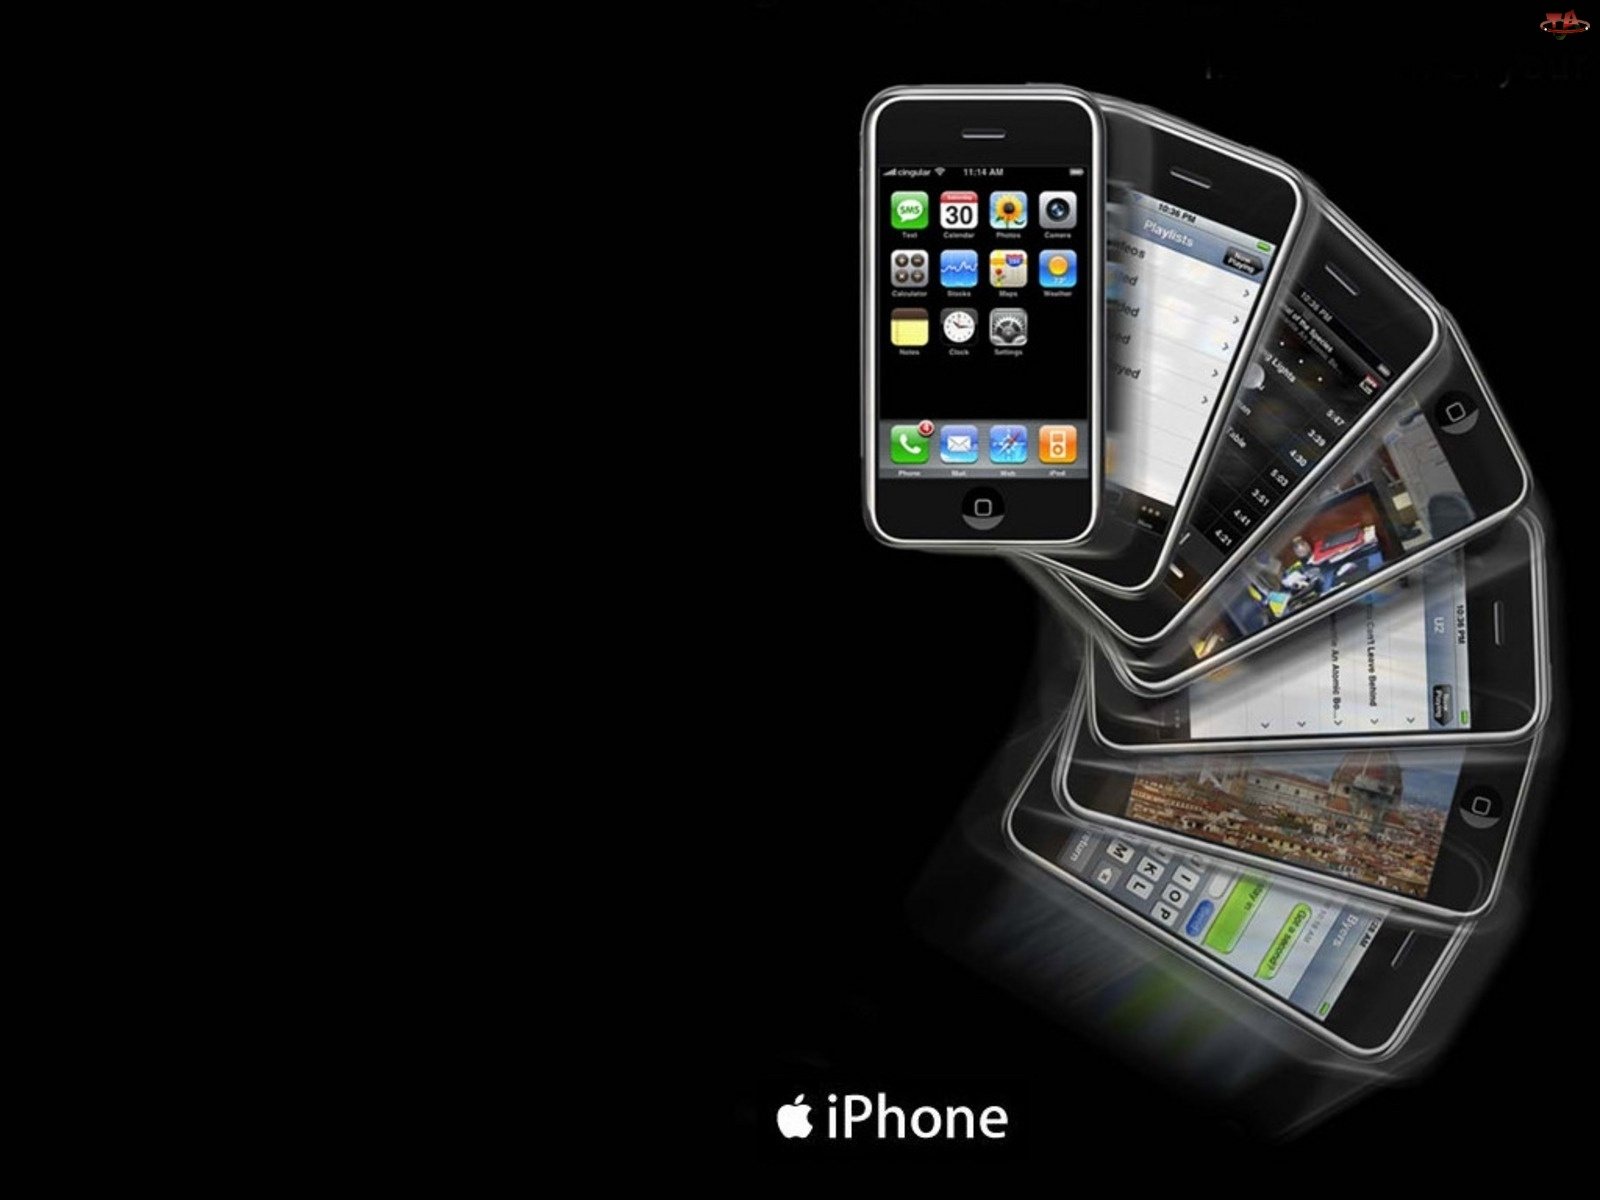 Iphone, Telefony, Komórkowe